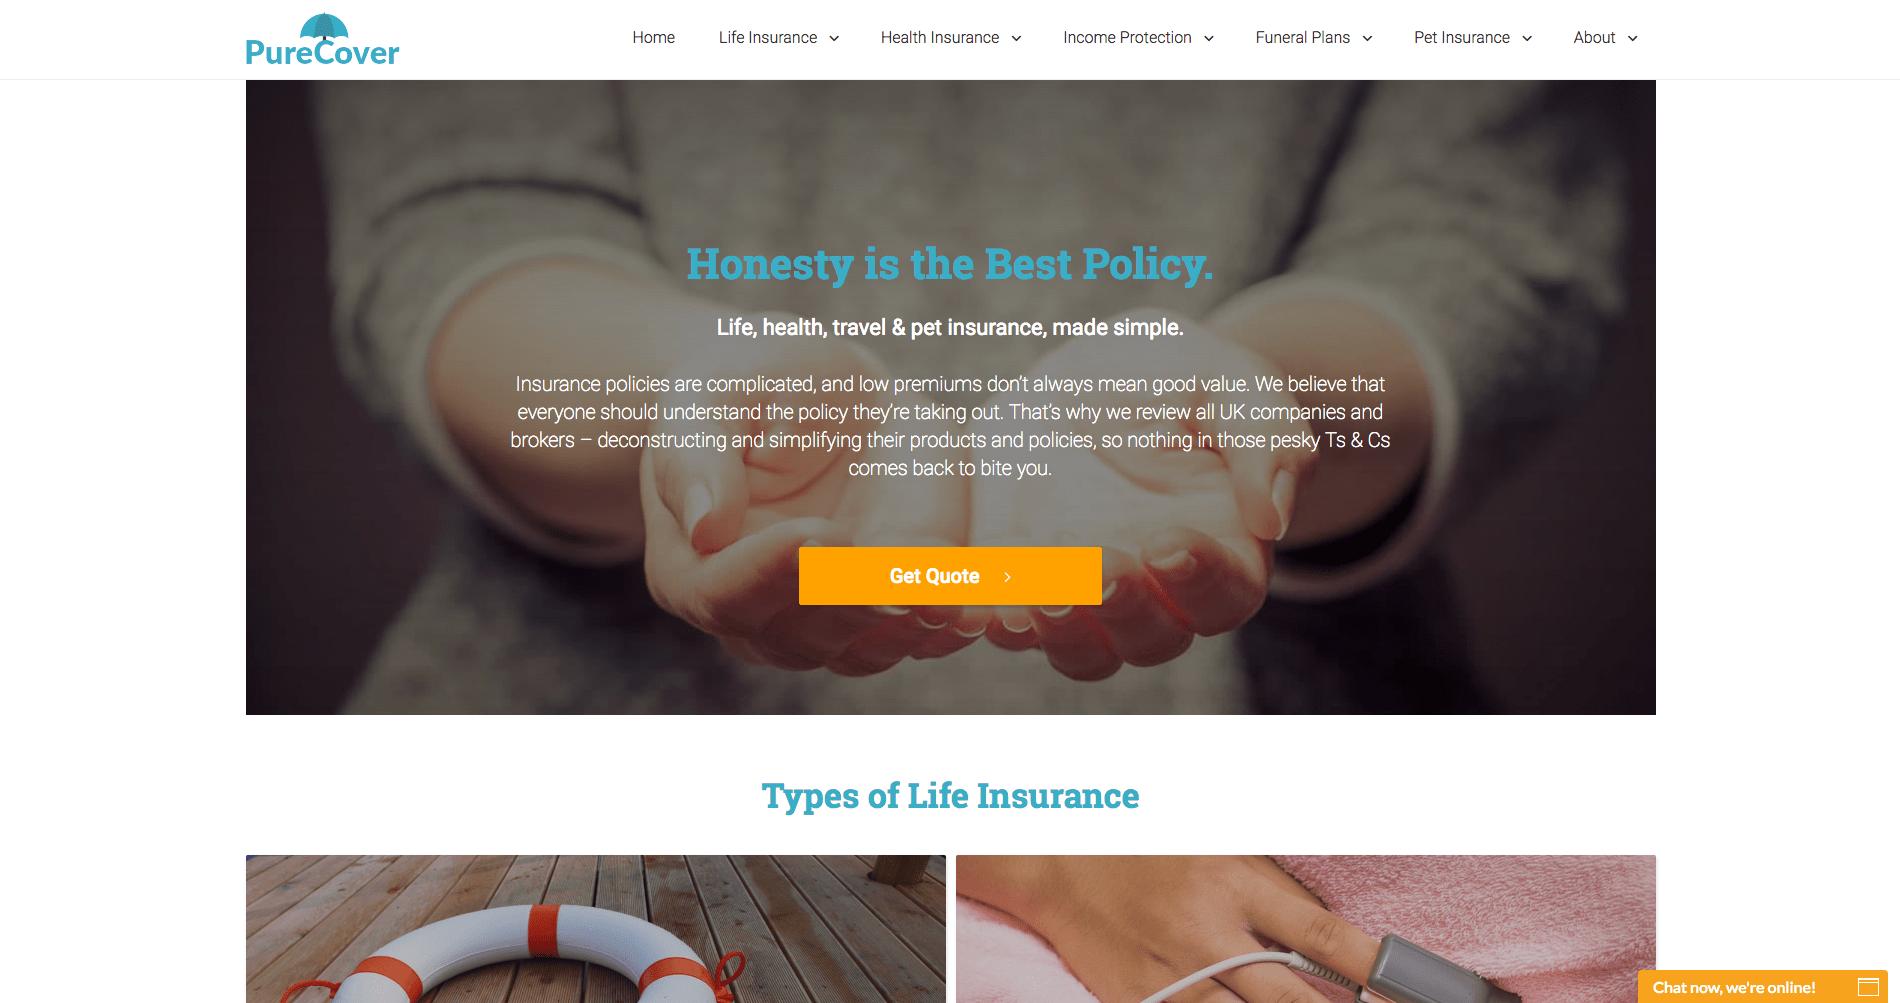 insurance-quotation-service5b6dbdb4e474101dd591104e